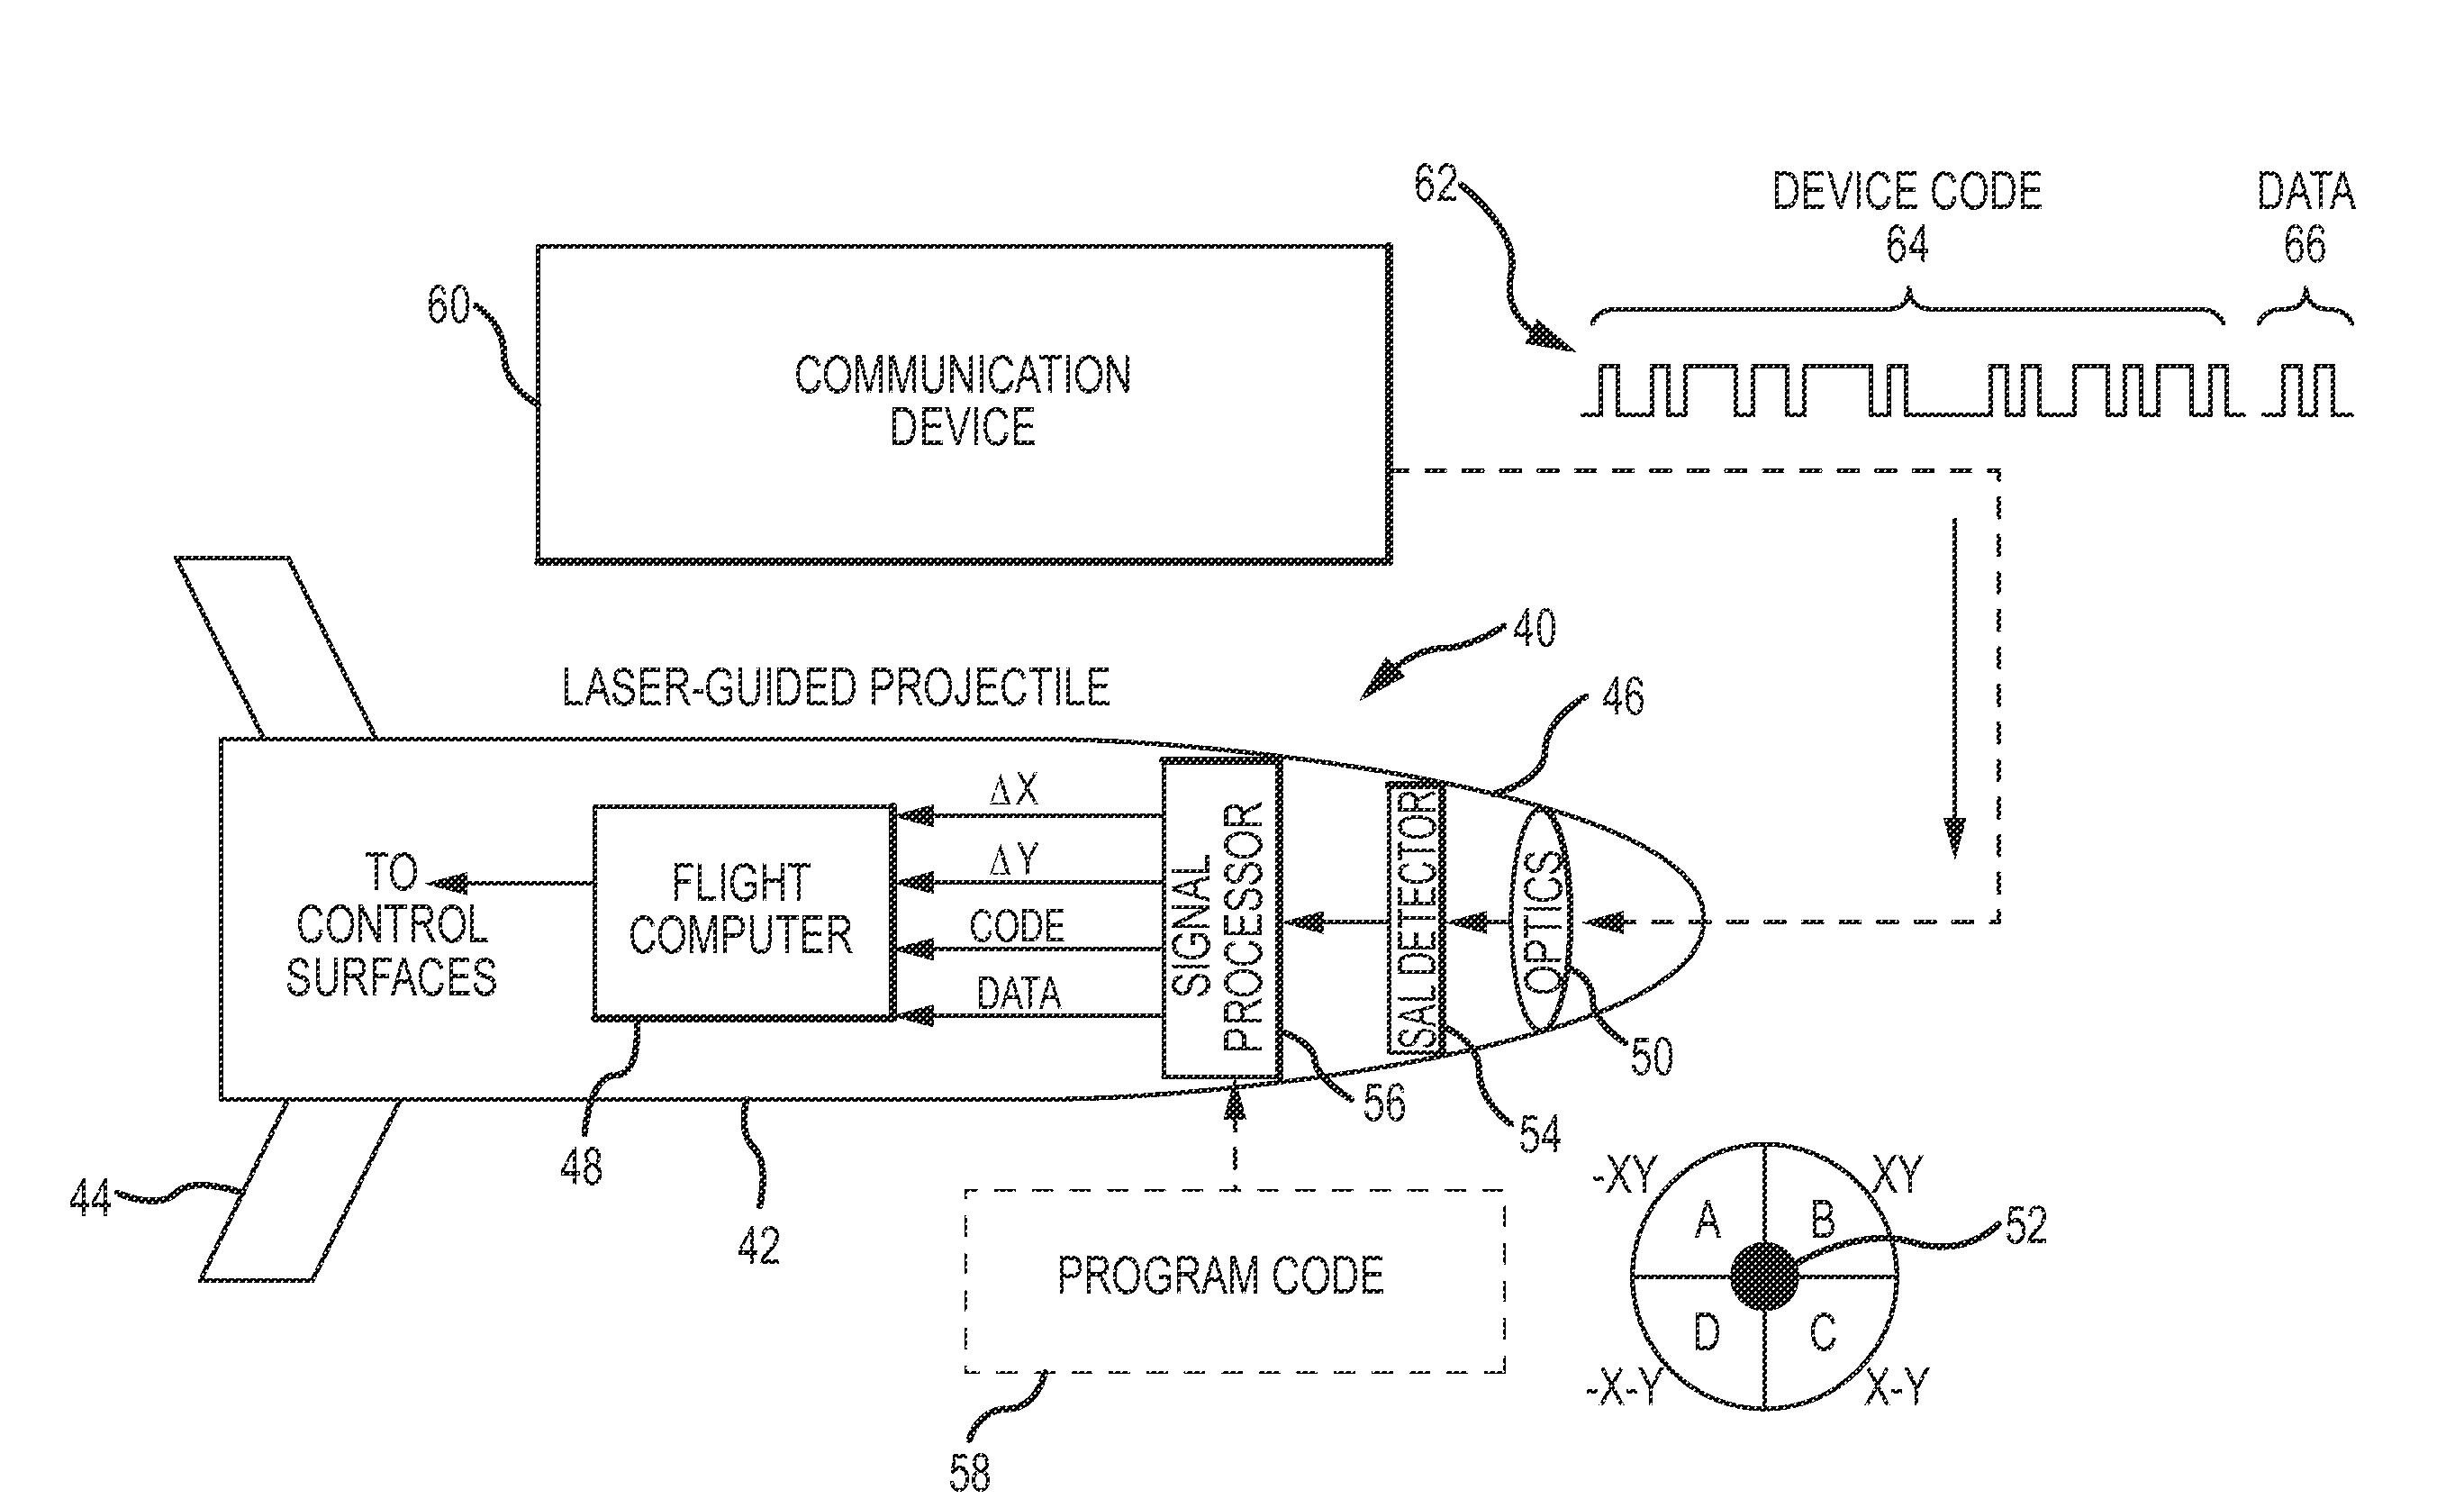 In Addition 2003 Saab 9 3 Wiring Diagram On Saab Color Codes Location